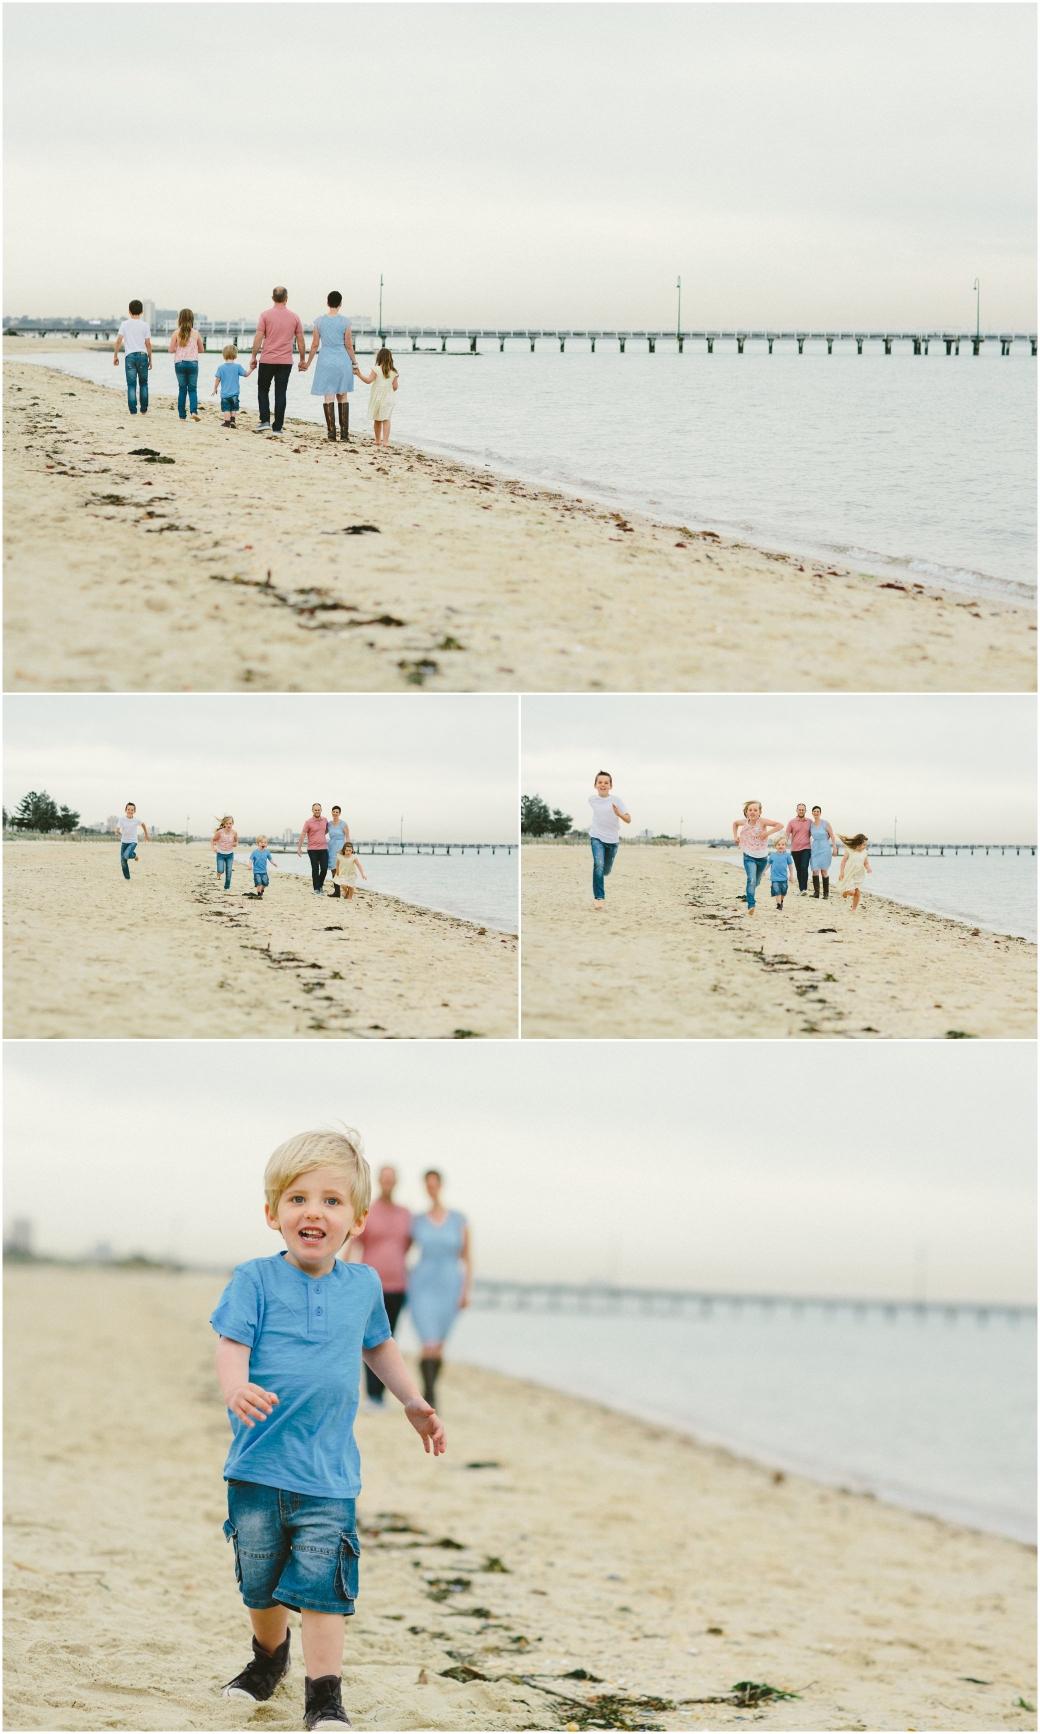 family photos melbourne family photographer beach portraits port melbourne innerwest melbourne photographer moments memories lifestyle portraits06